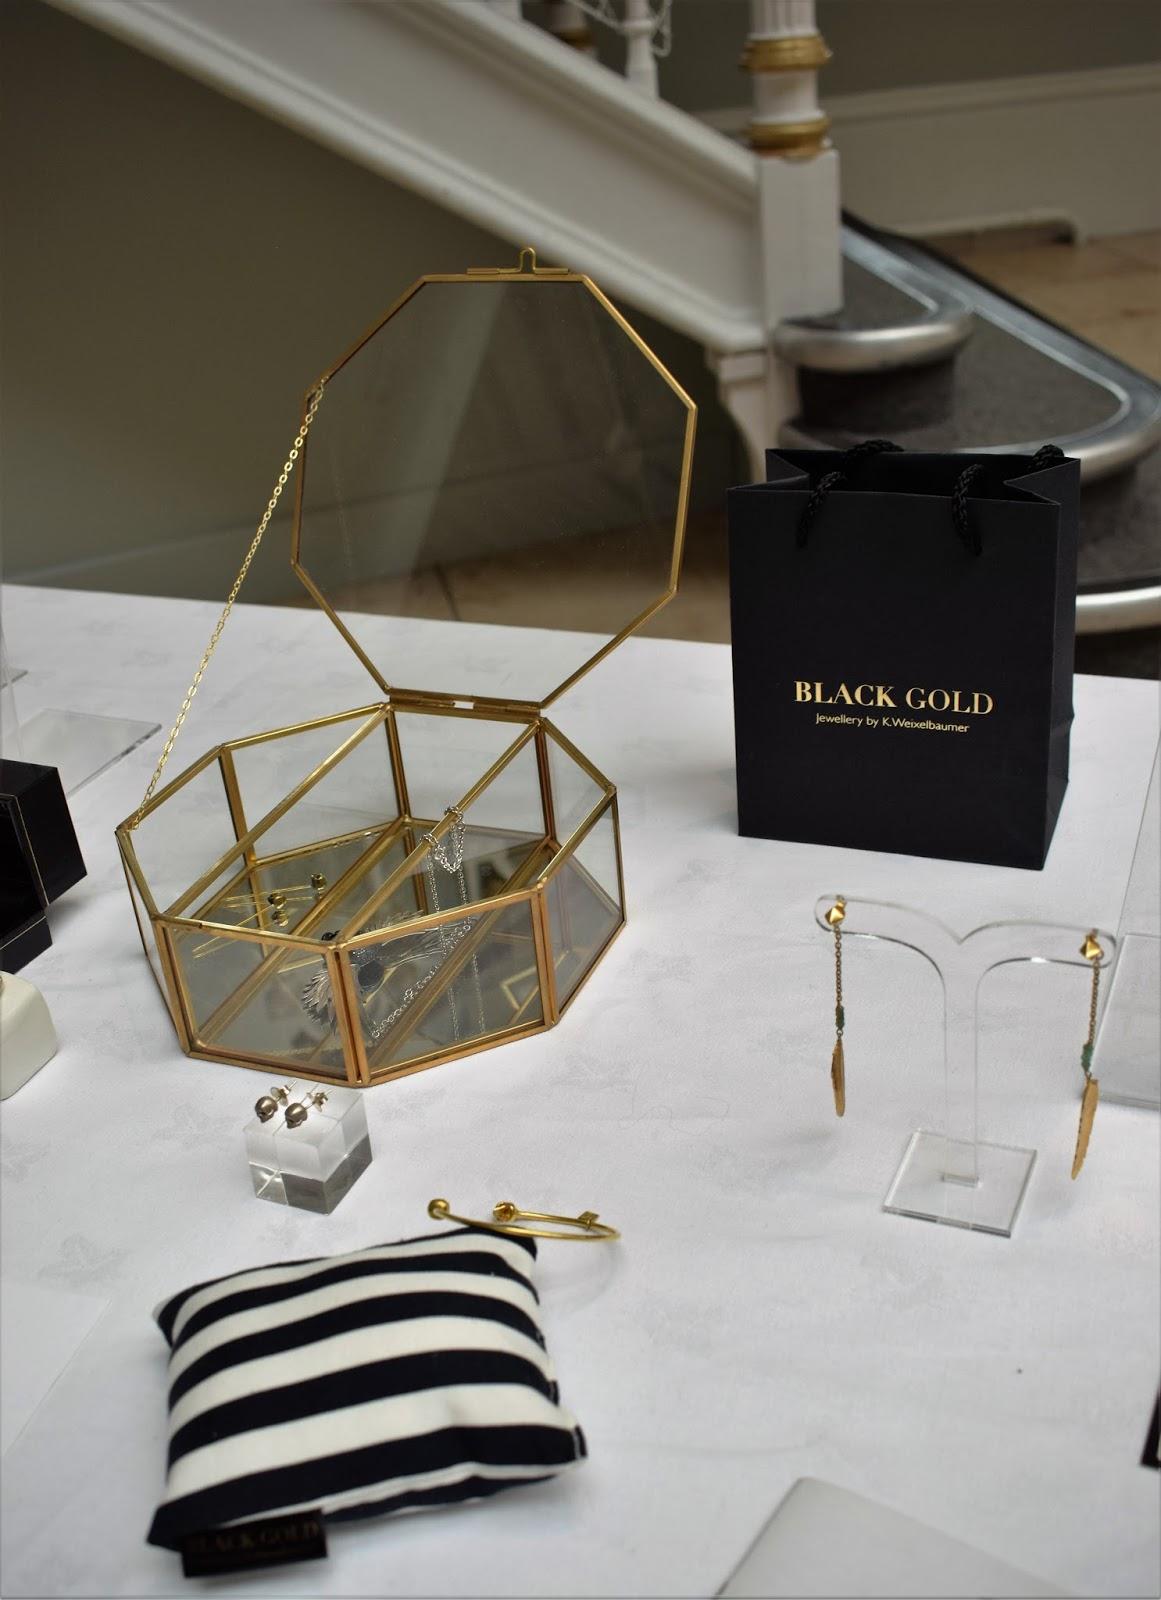 Edinburgh International Fashion Festival, jewellery exhibition at national museum of scotland edinburgh, black gold jewellery by black betty South Africa